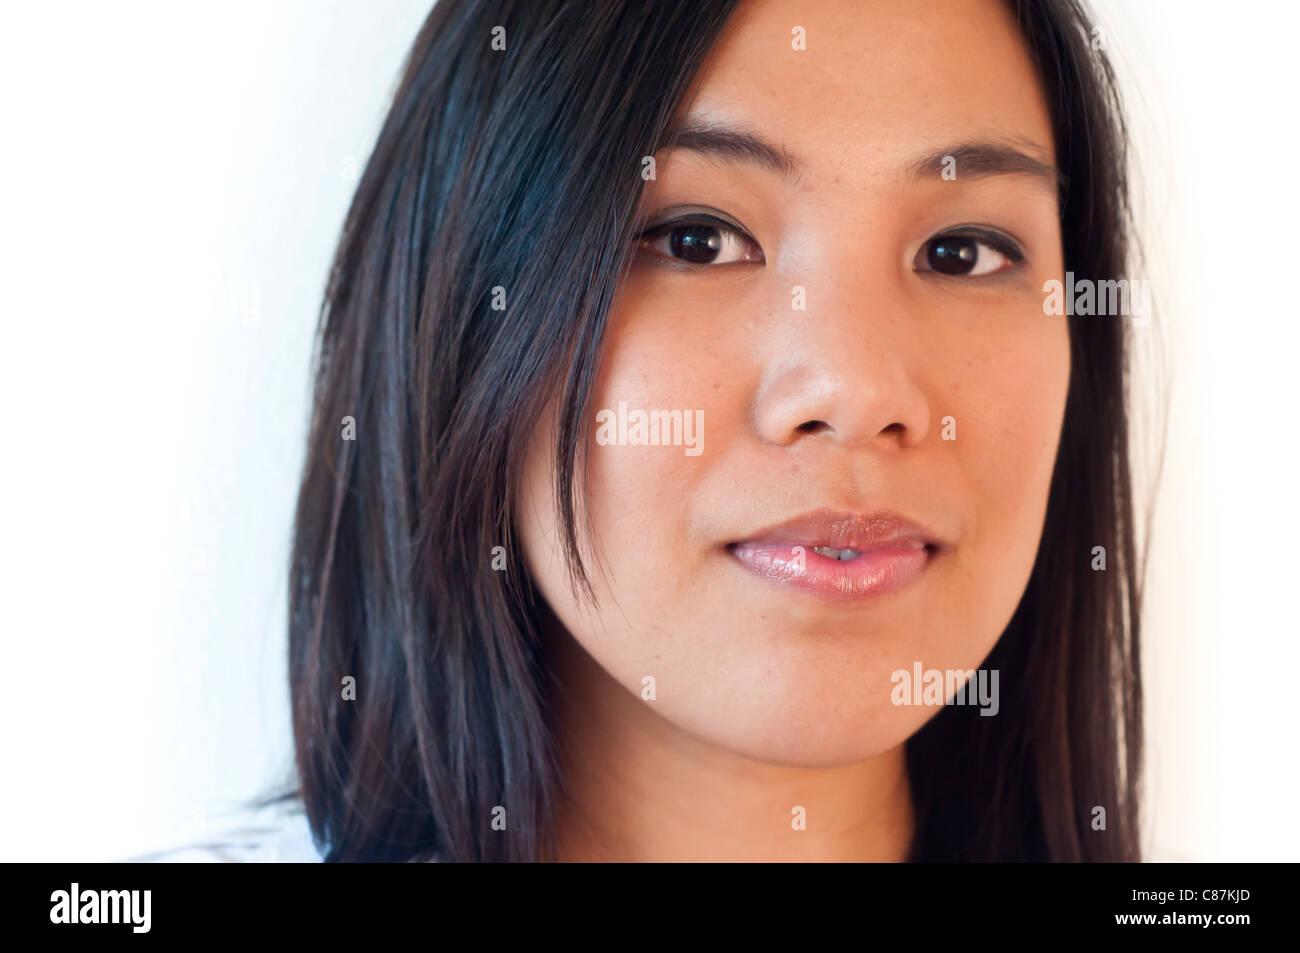 Asian woman portrait-No negative usage allowed - Stock Image